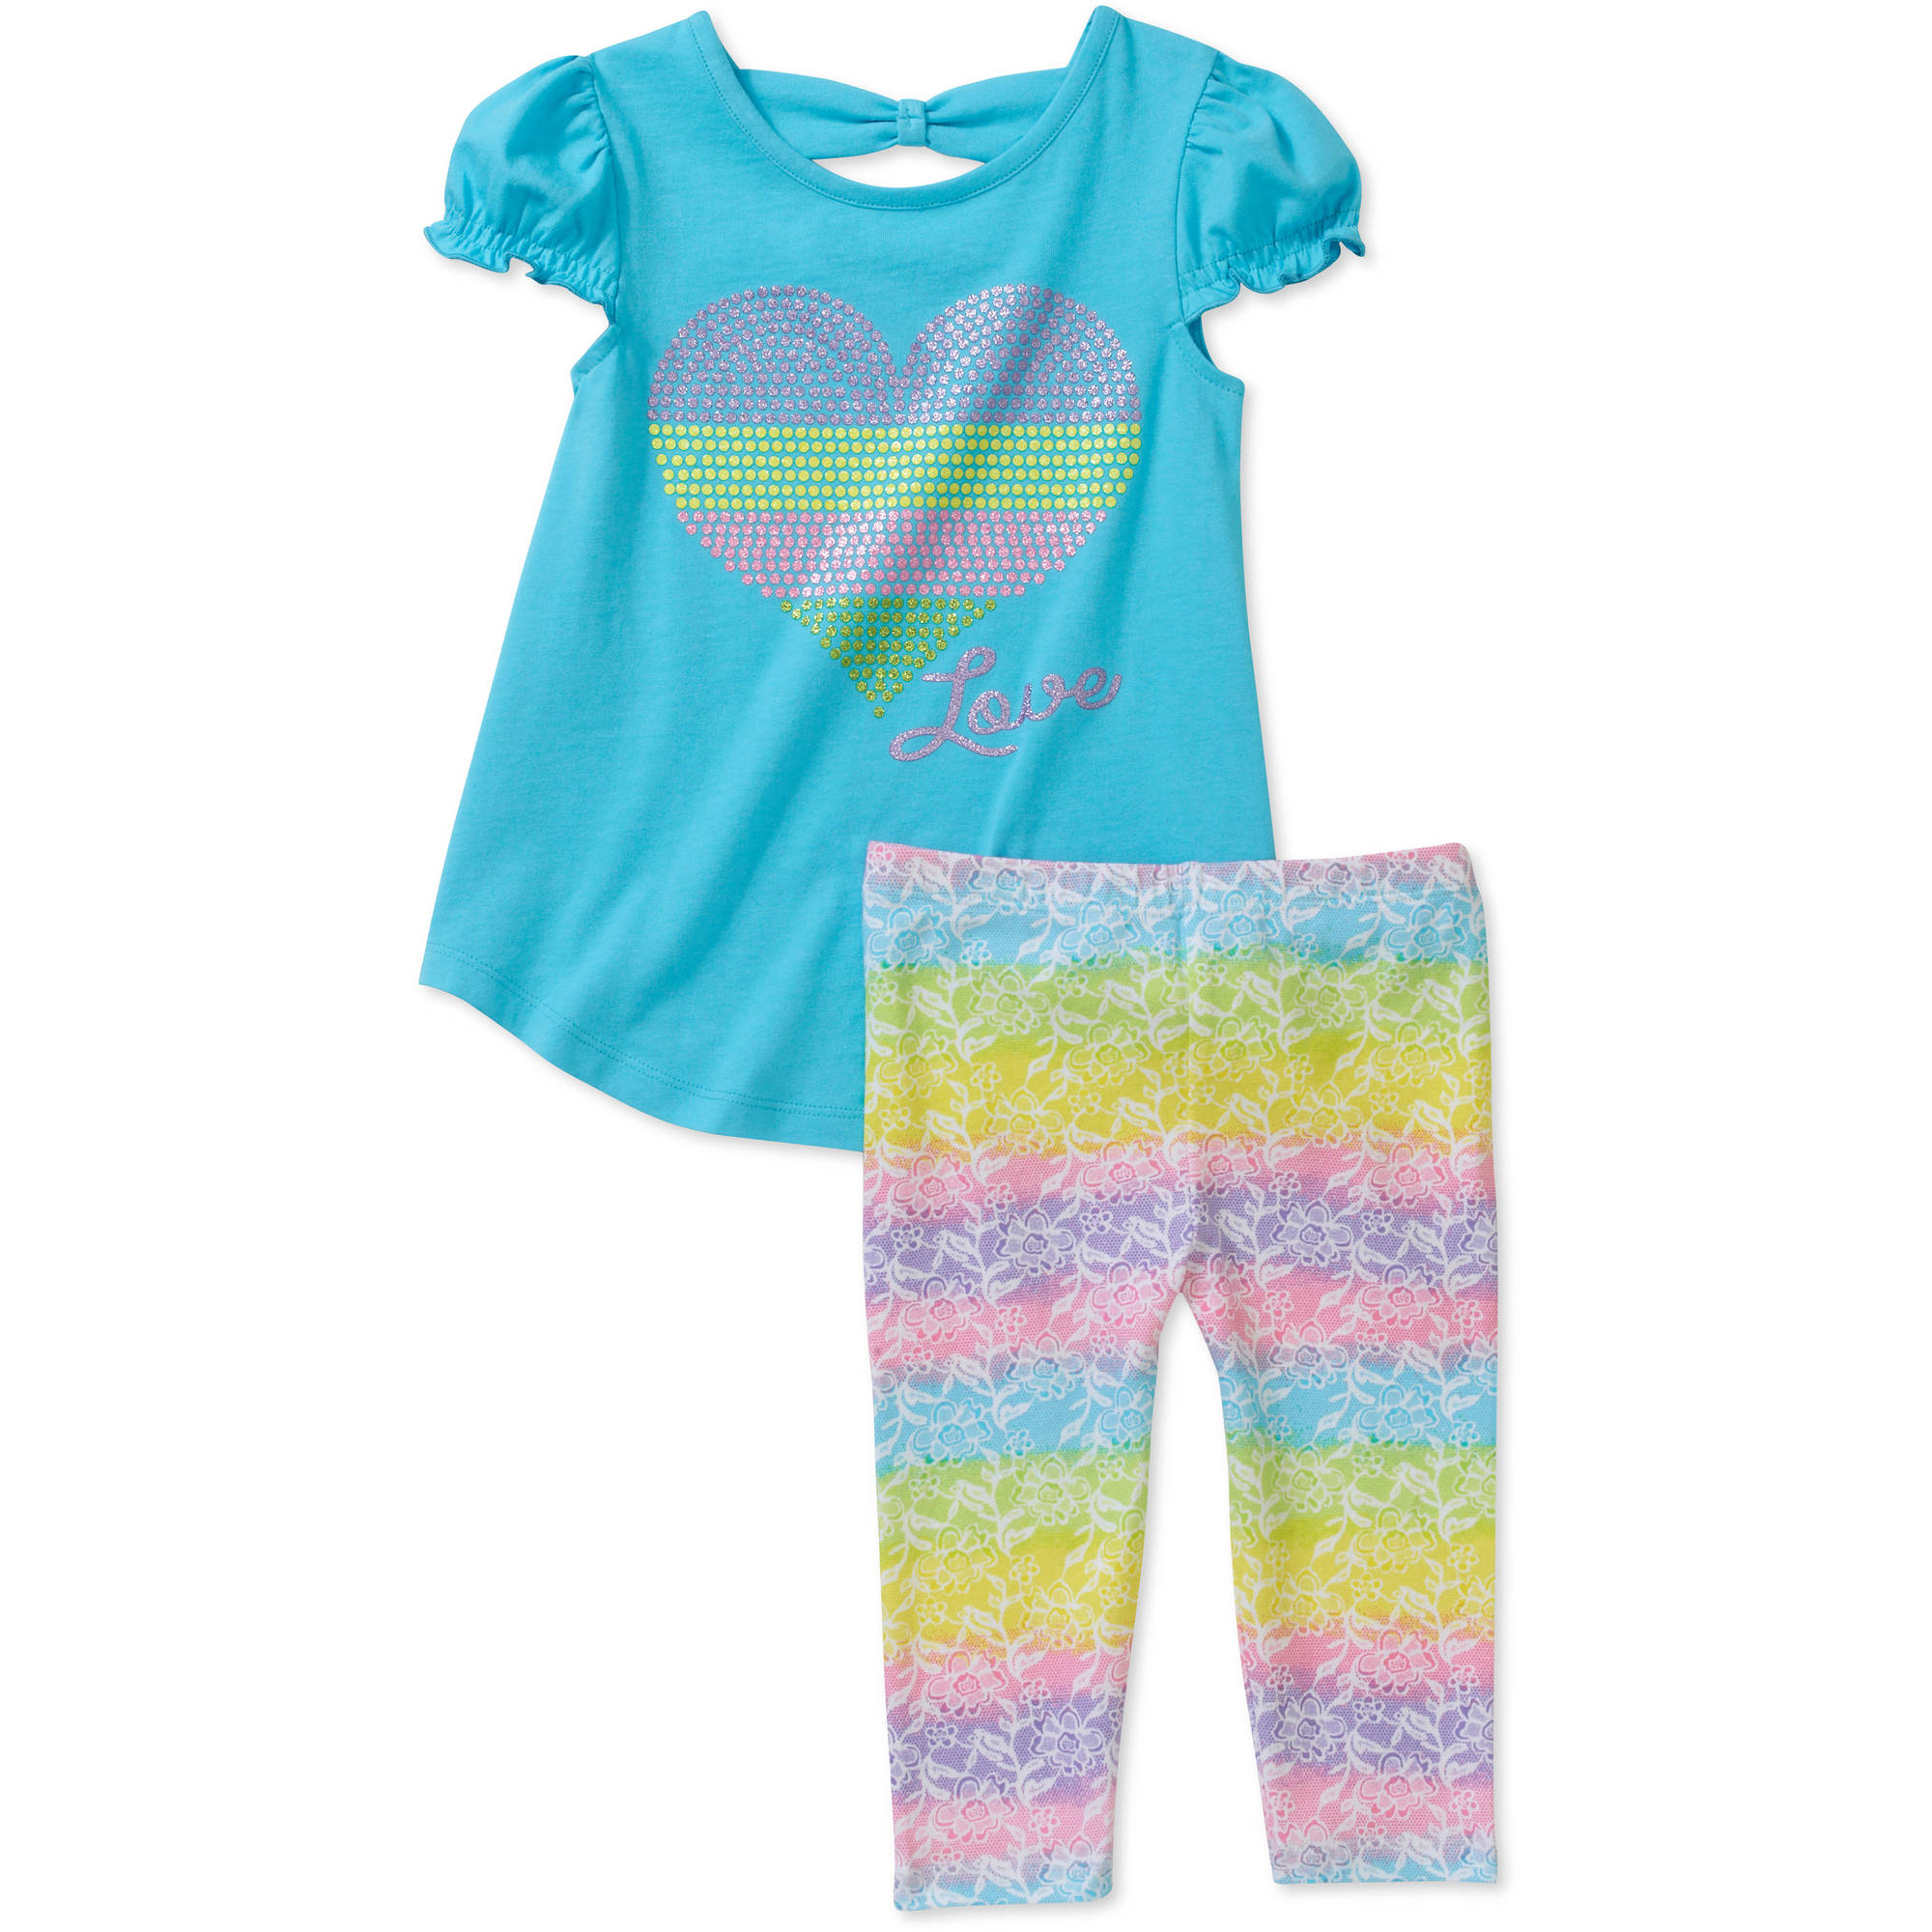 Healthtex Baby Girls' 2 Piece Glitter Tunic and Pant Set